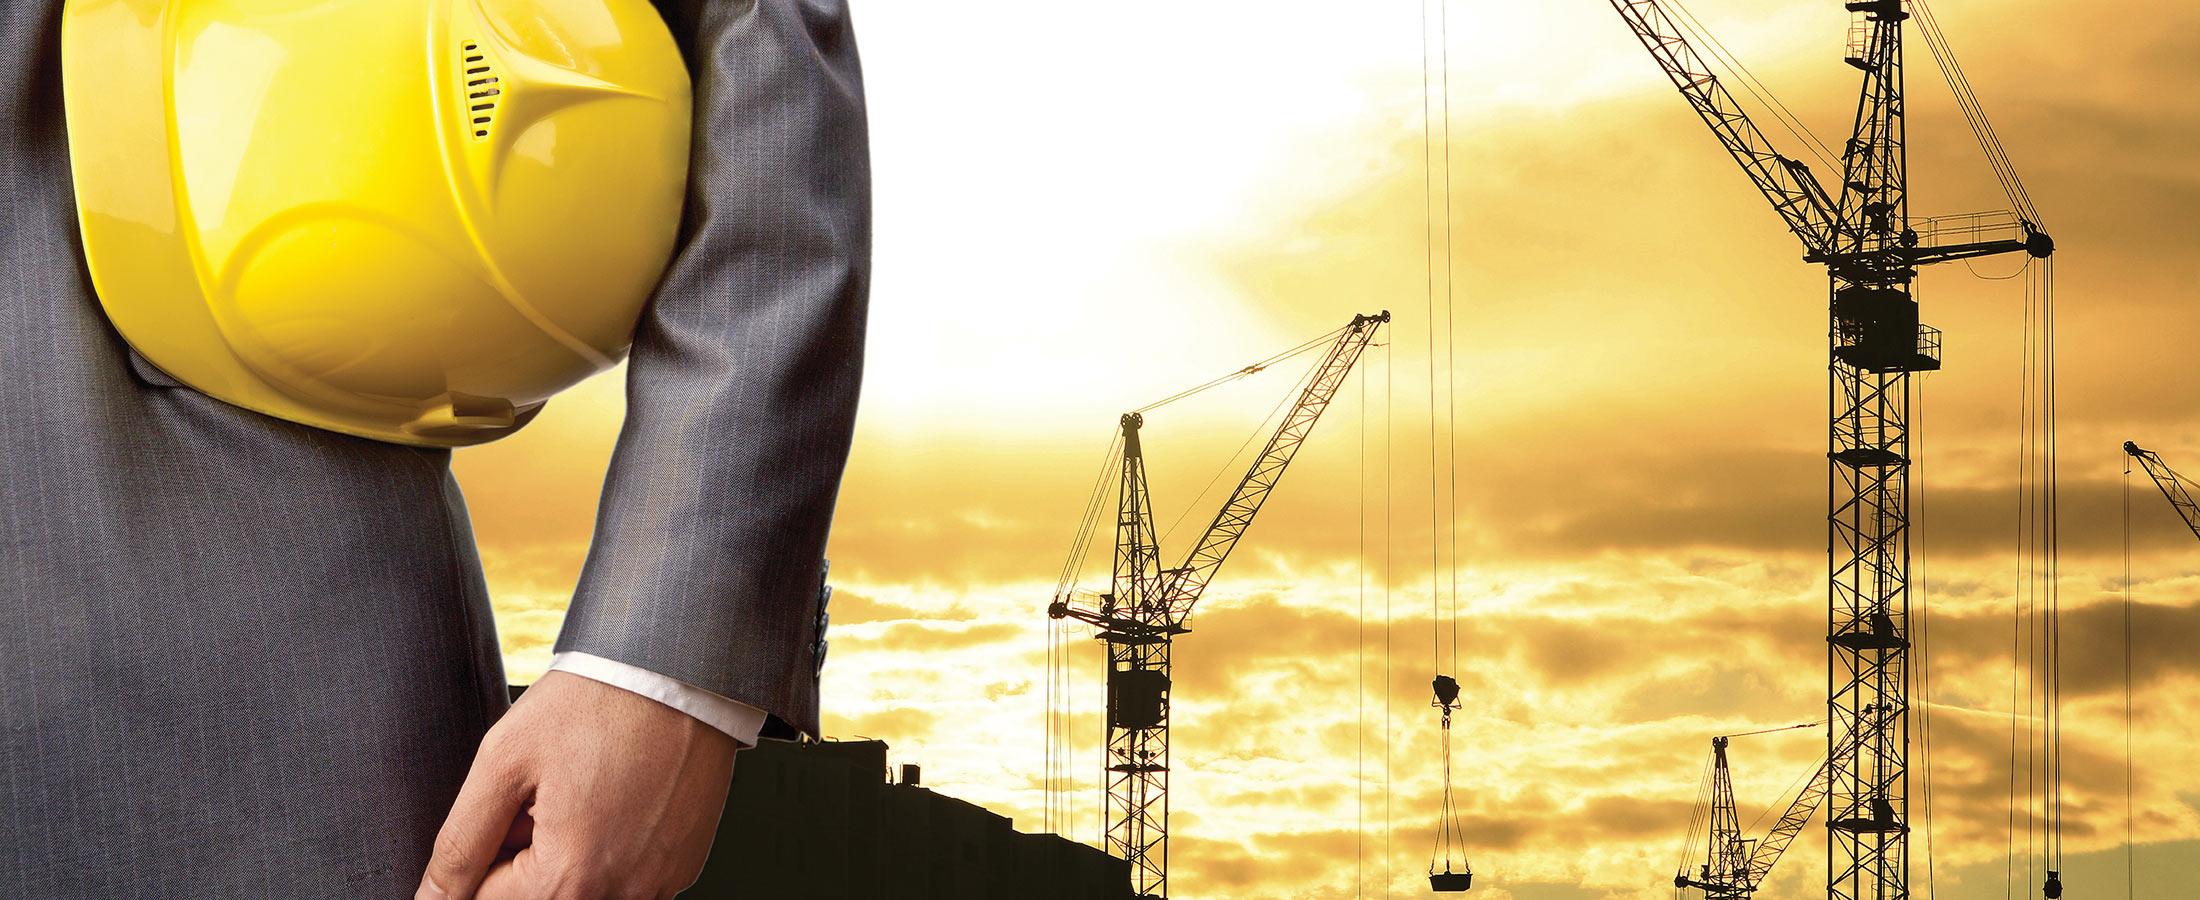 construction liability insurance photo - 1